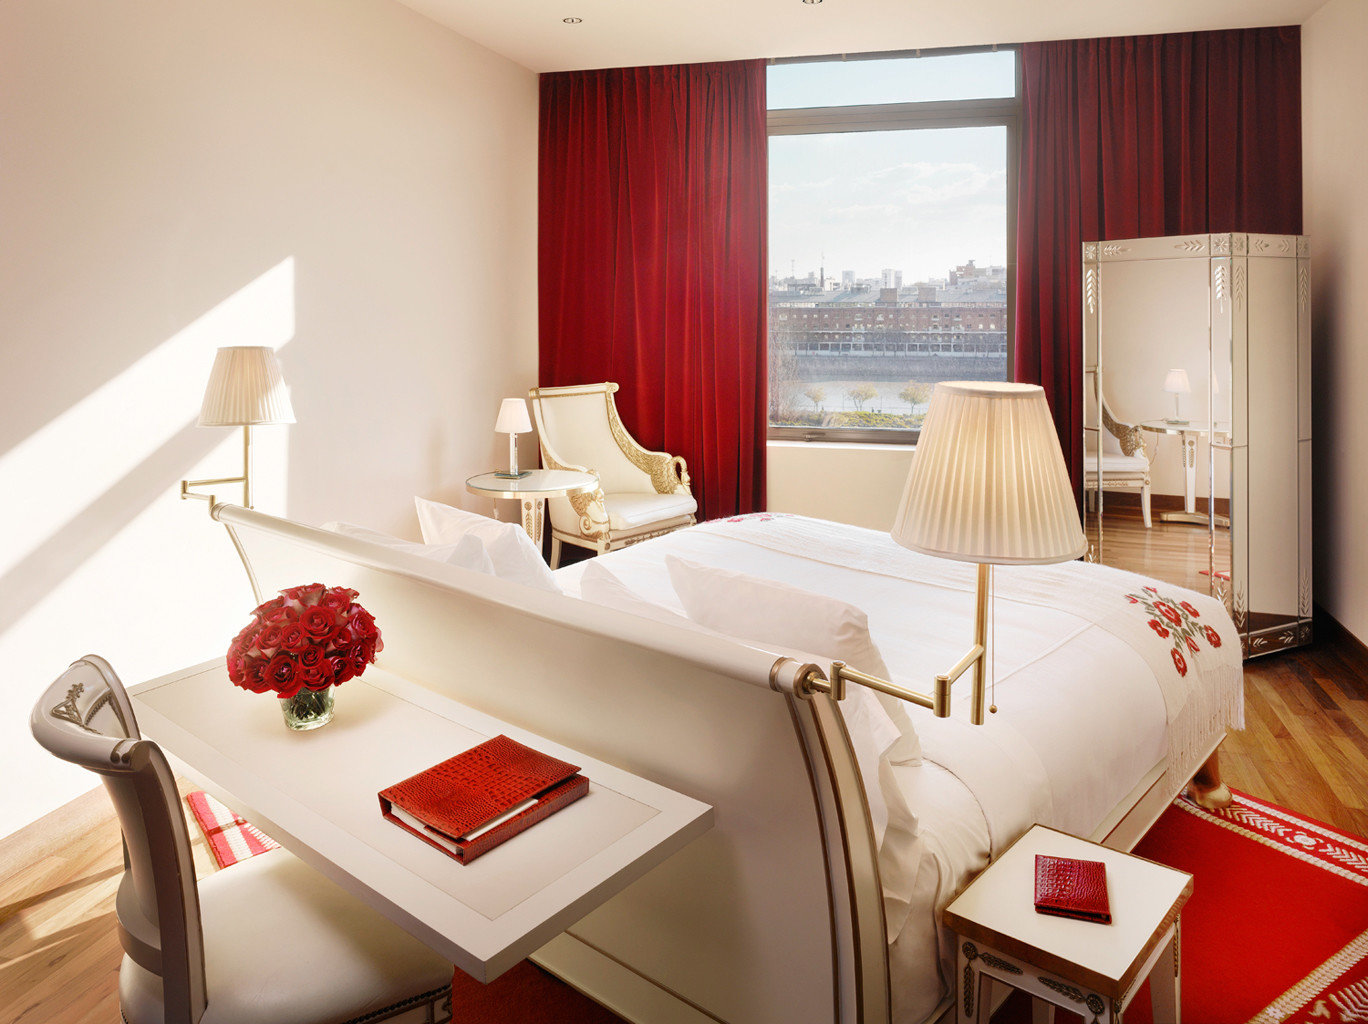 Bedroom Cultural Elegant Historic Luxury property Suite red living room cottage bed sheet flat